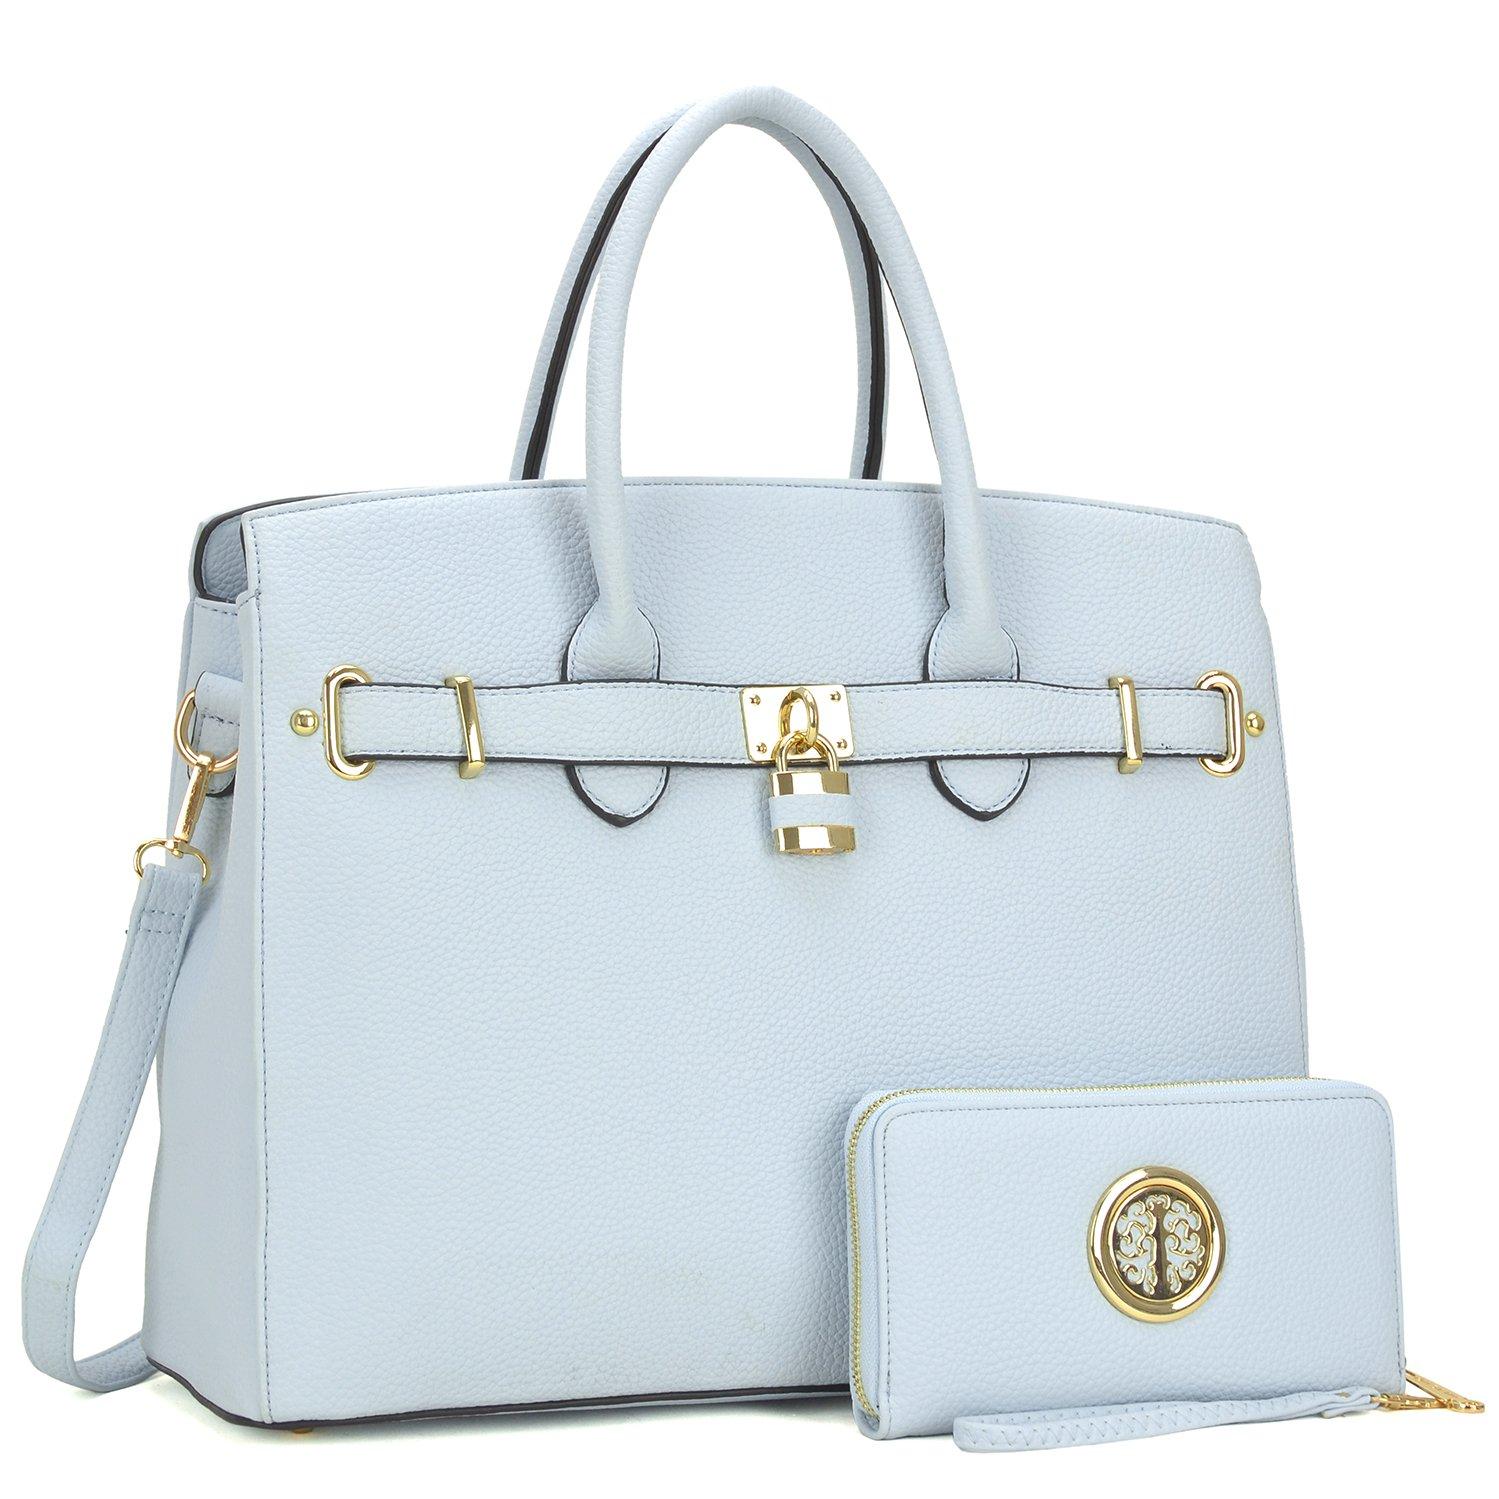 Women Large Handbag Designer Purse 2 Pieces Set Leather Satchel Top Handle Shoulder Bag Light Blue